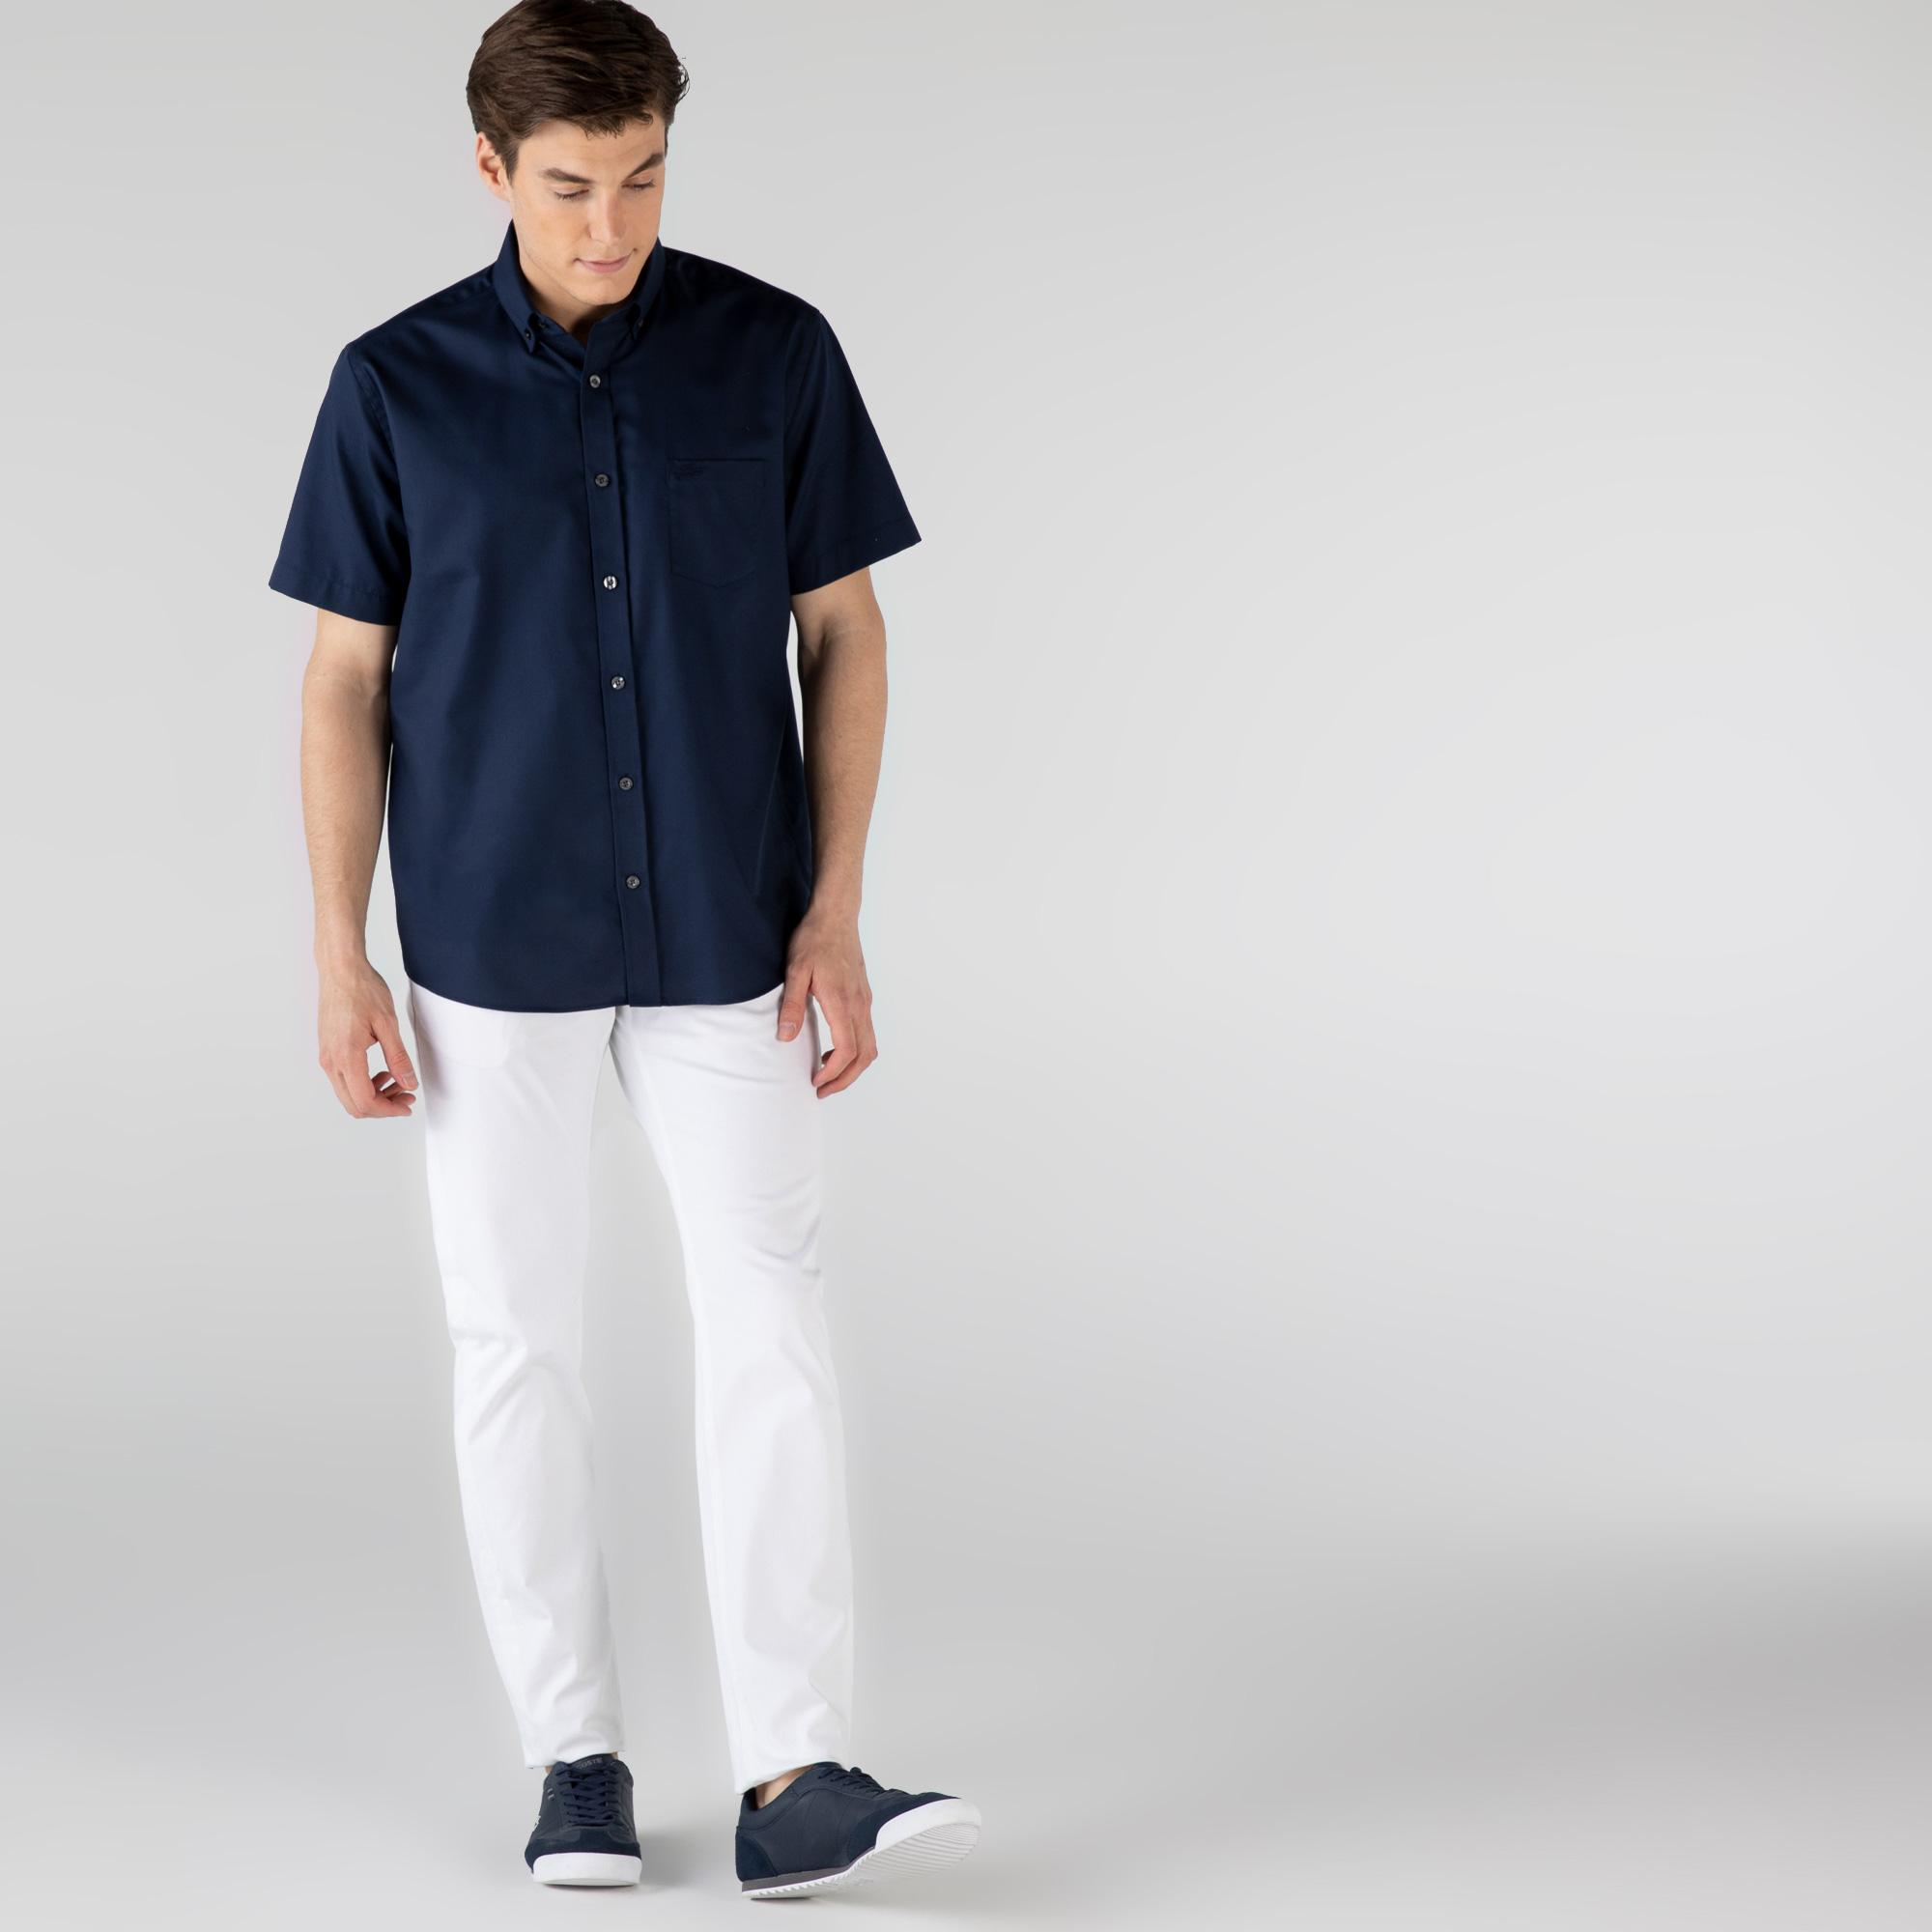 Lacoste Erkek Slim Fit Beyaz Denim Pantolon